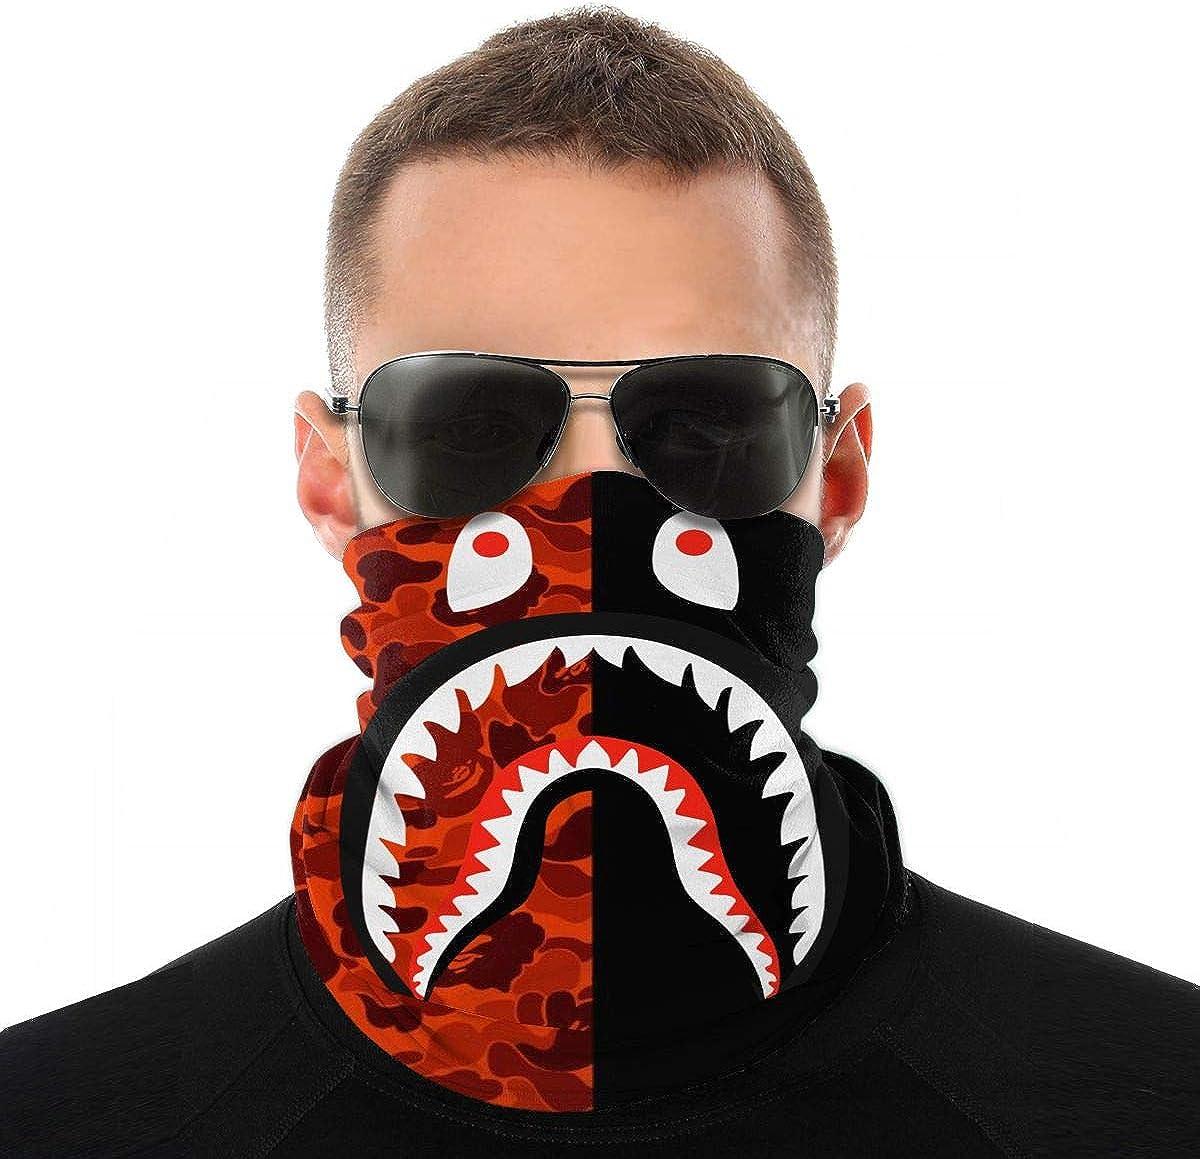 Bape Blood Shark Neck Gaiter Scarf Face Cover-Dust,Outdoor Sun Protection Cool Lightweight Windproof Uv Balaclava Bandana